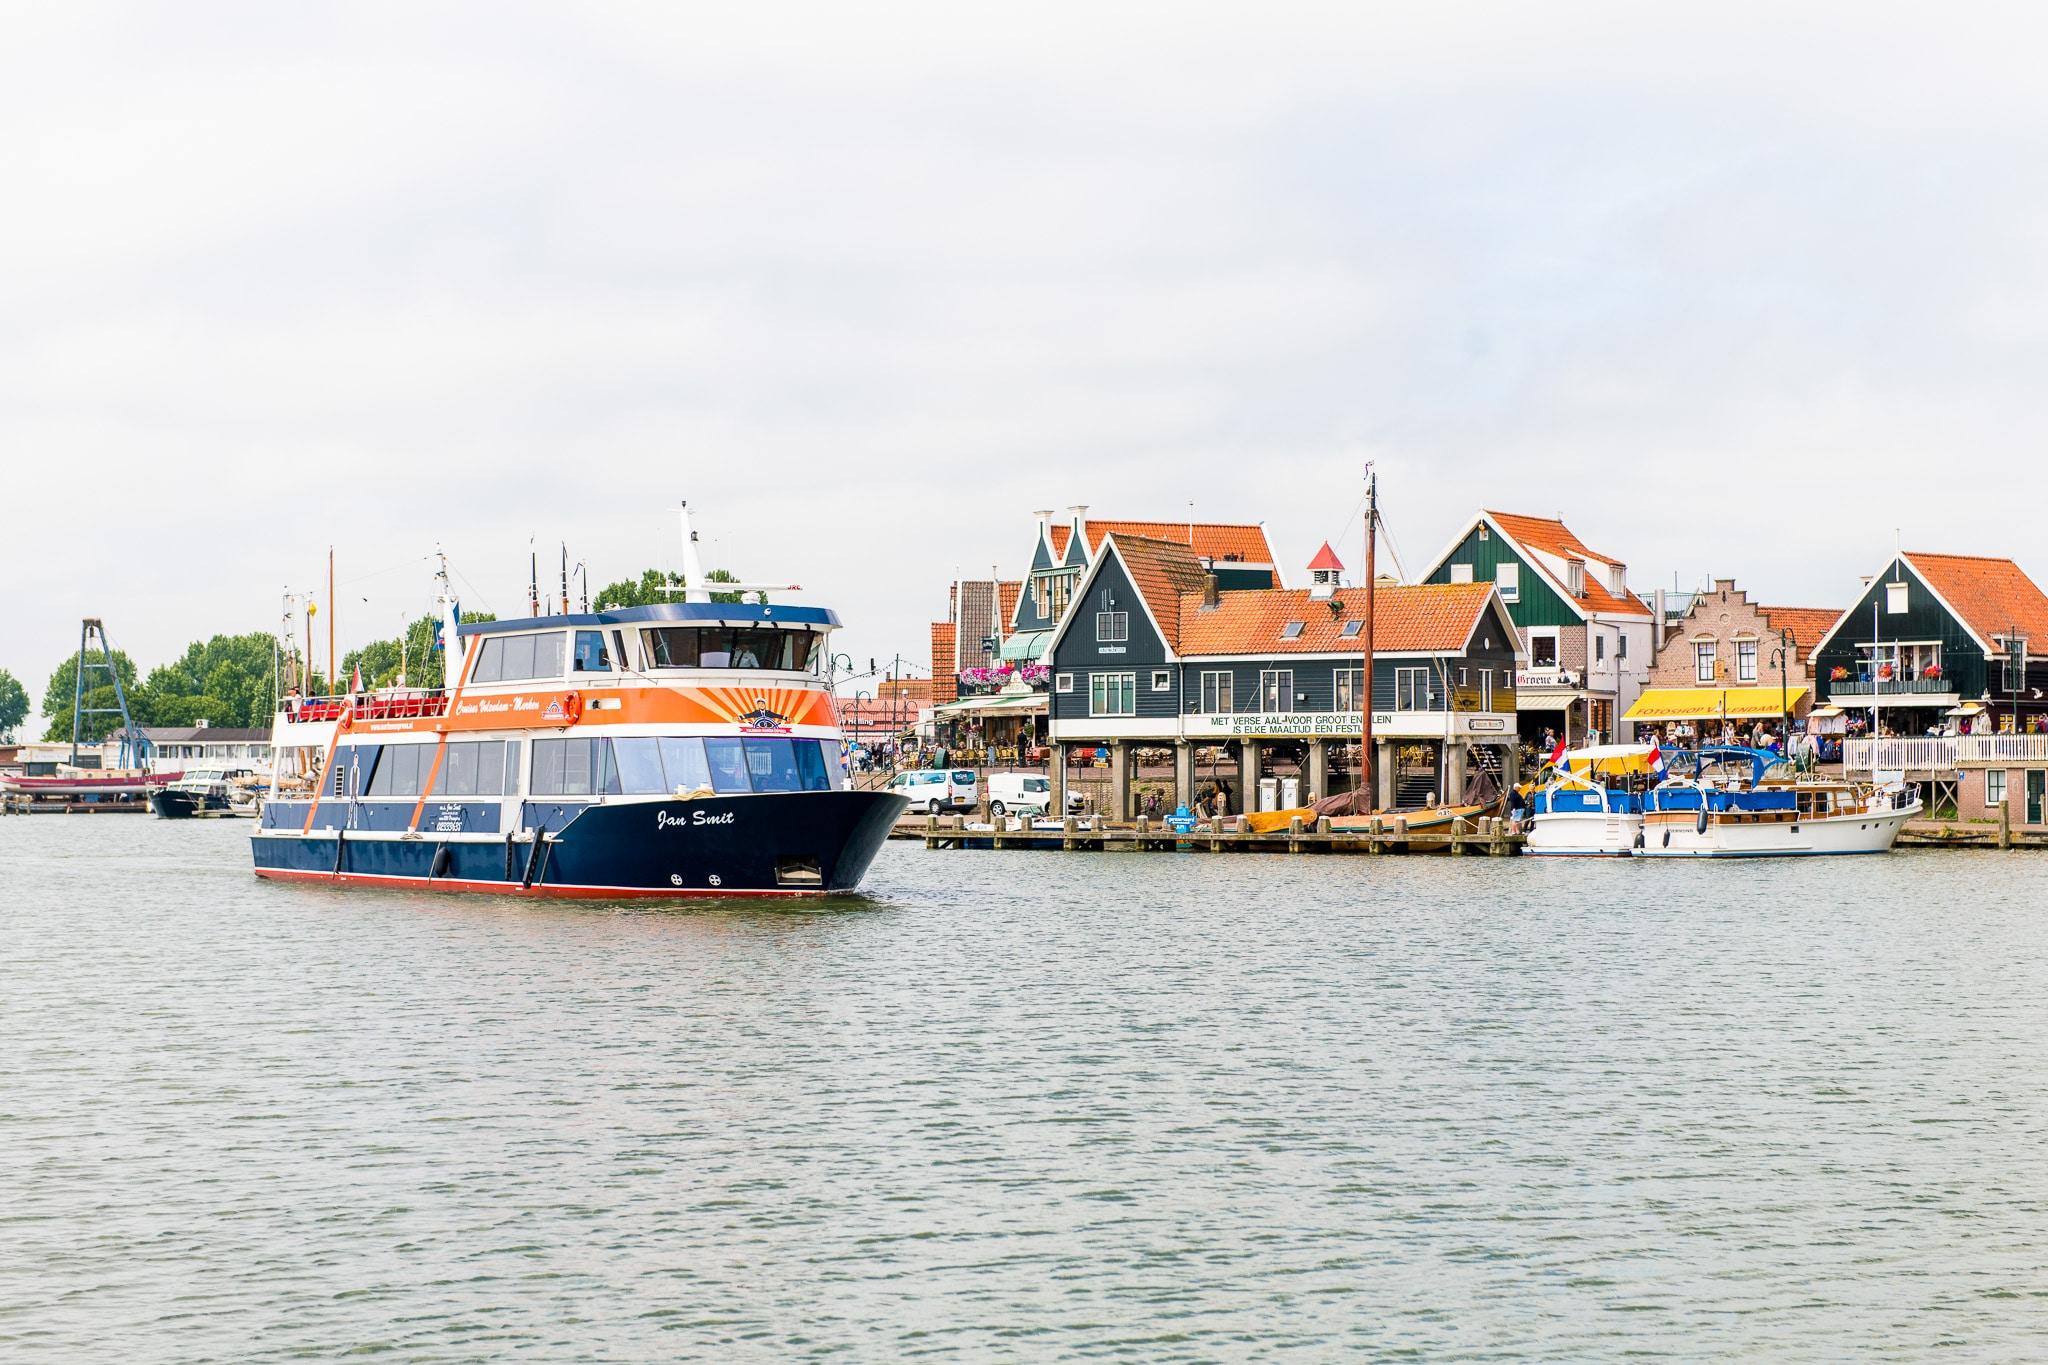 © Twycer / www.twycer.nl